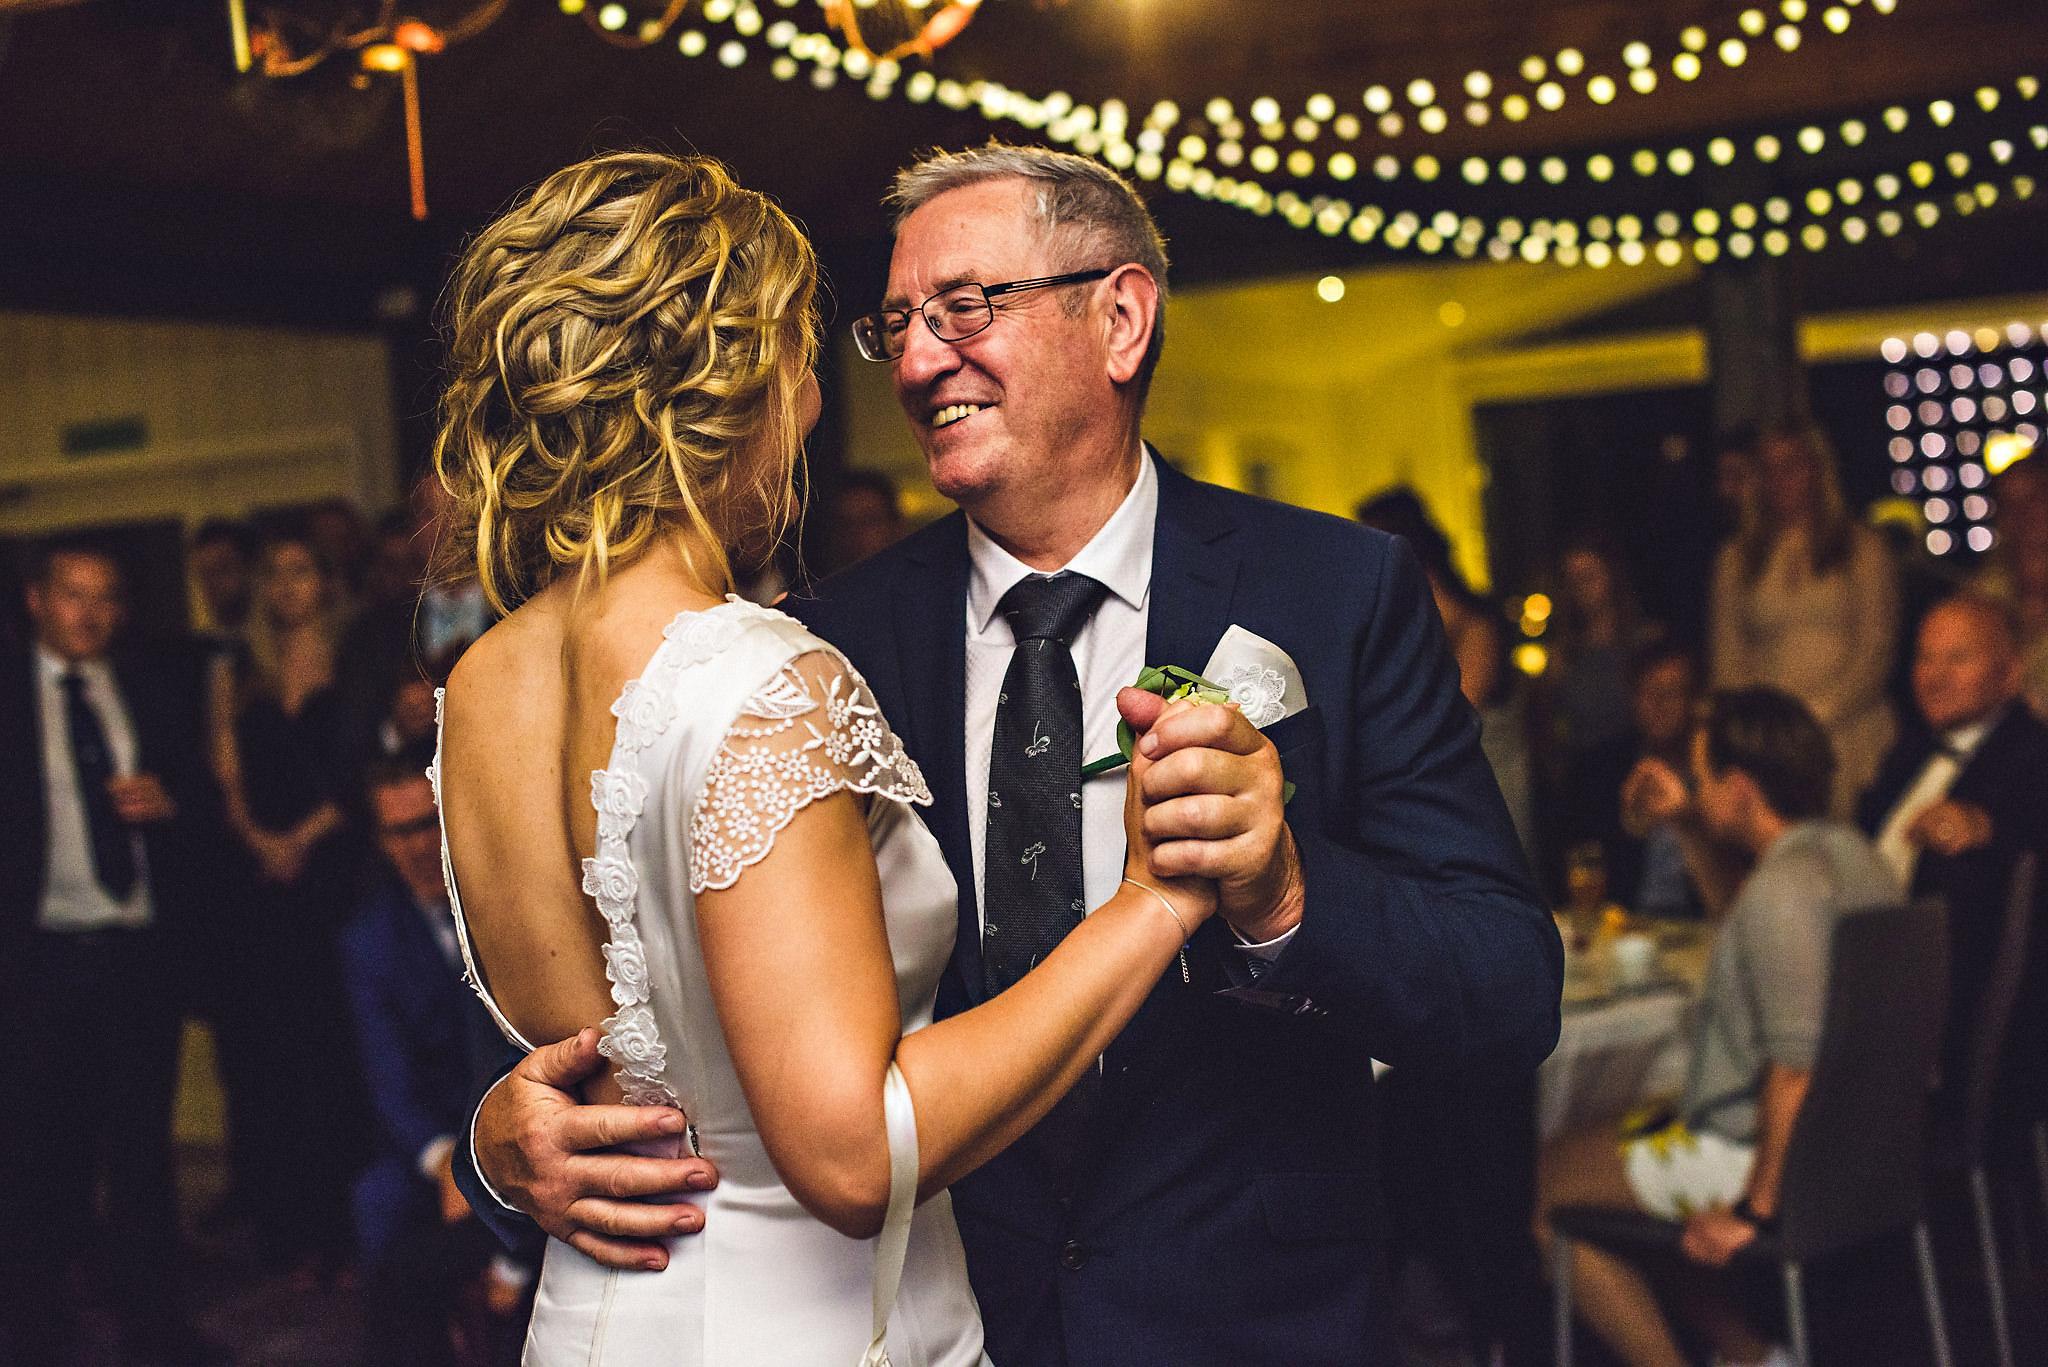 Bryllup på Yrineset i Oldedalen bryllupsfotograf sogn og fjordane-50.jpg